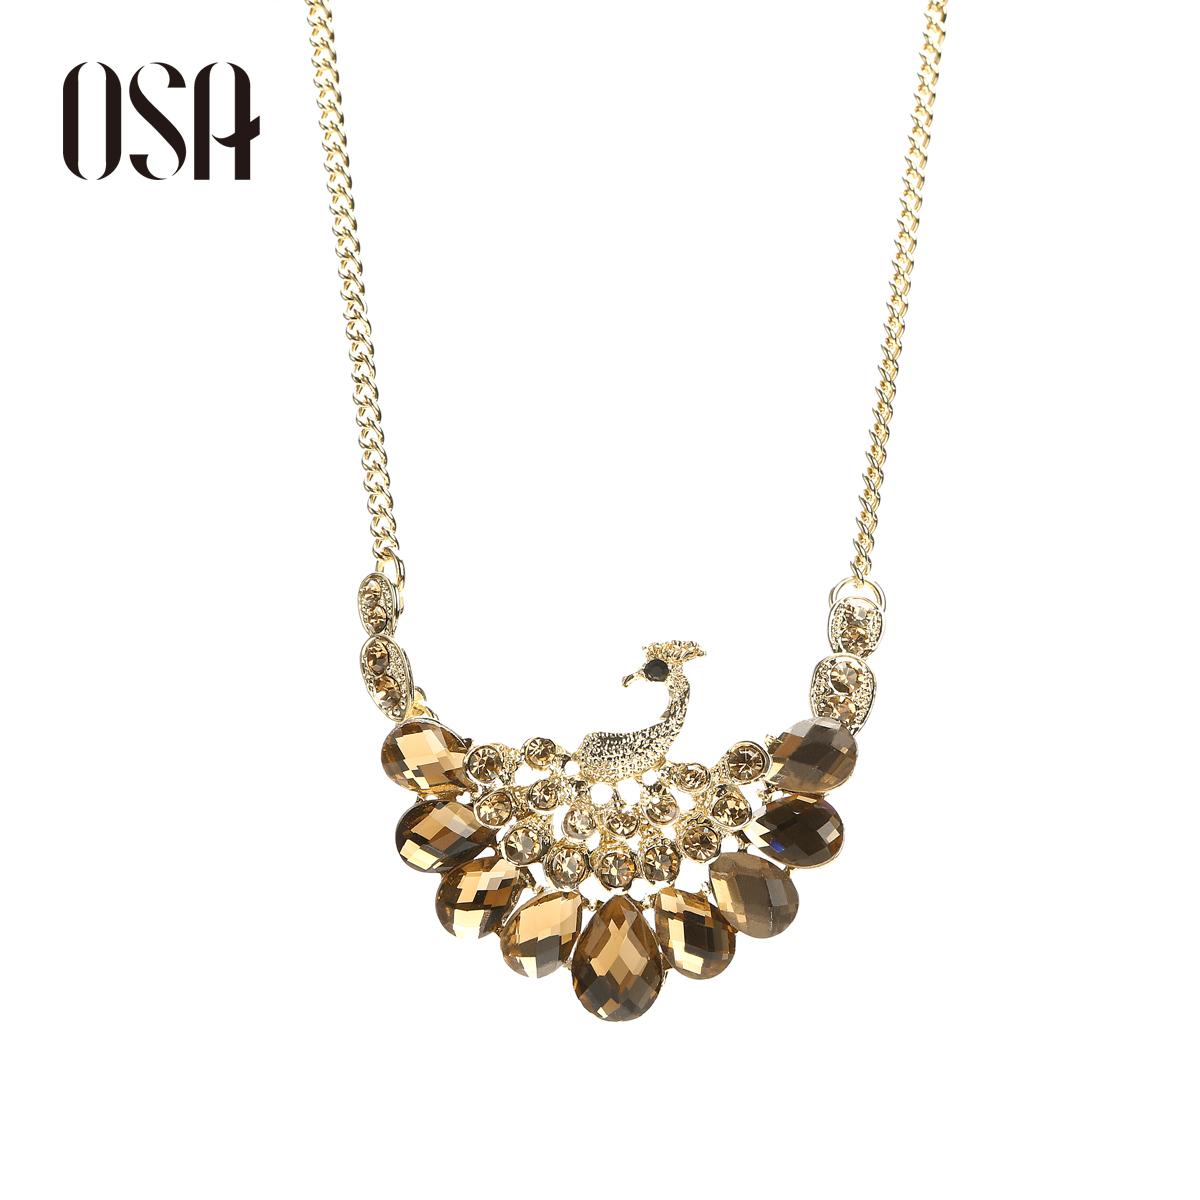 OSA2013冬季新款女饰品 时尚捷克钻孔雀吊坠铁链项链P35305